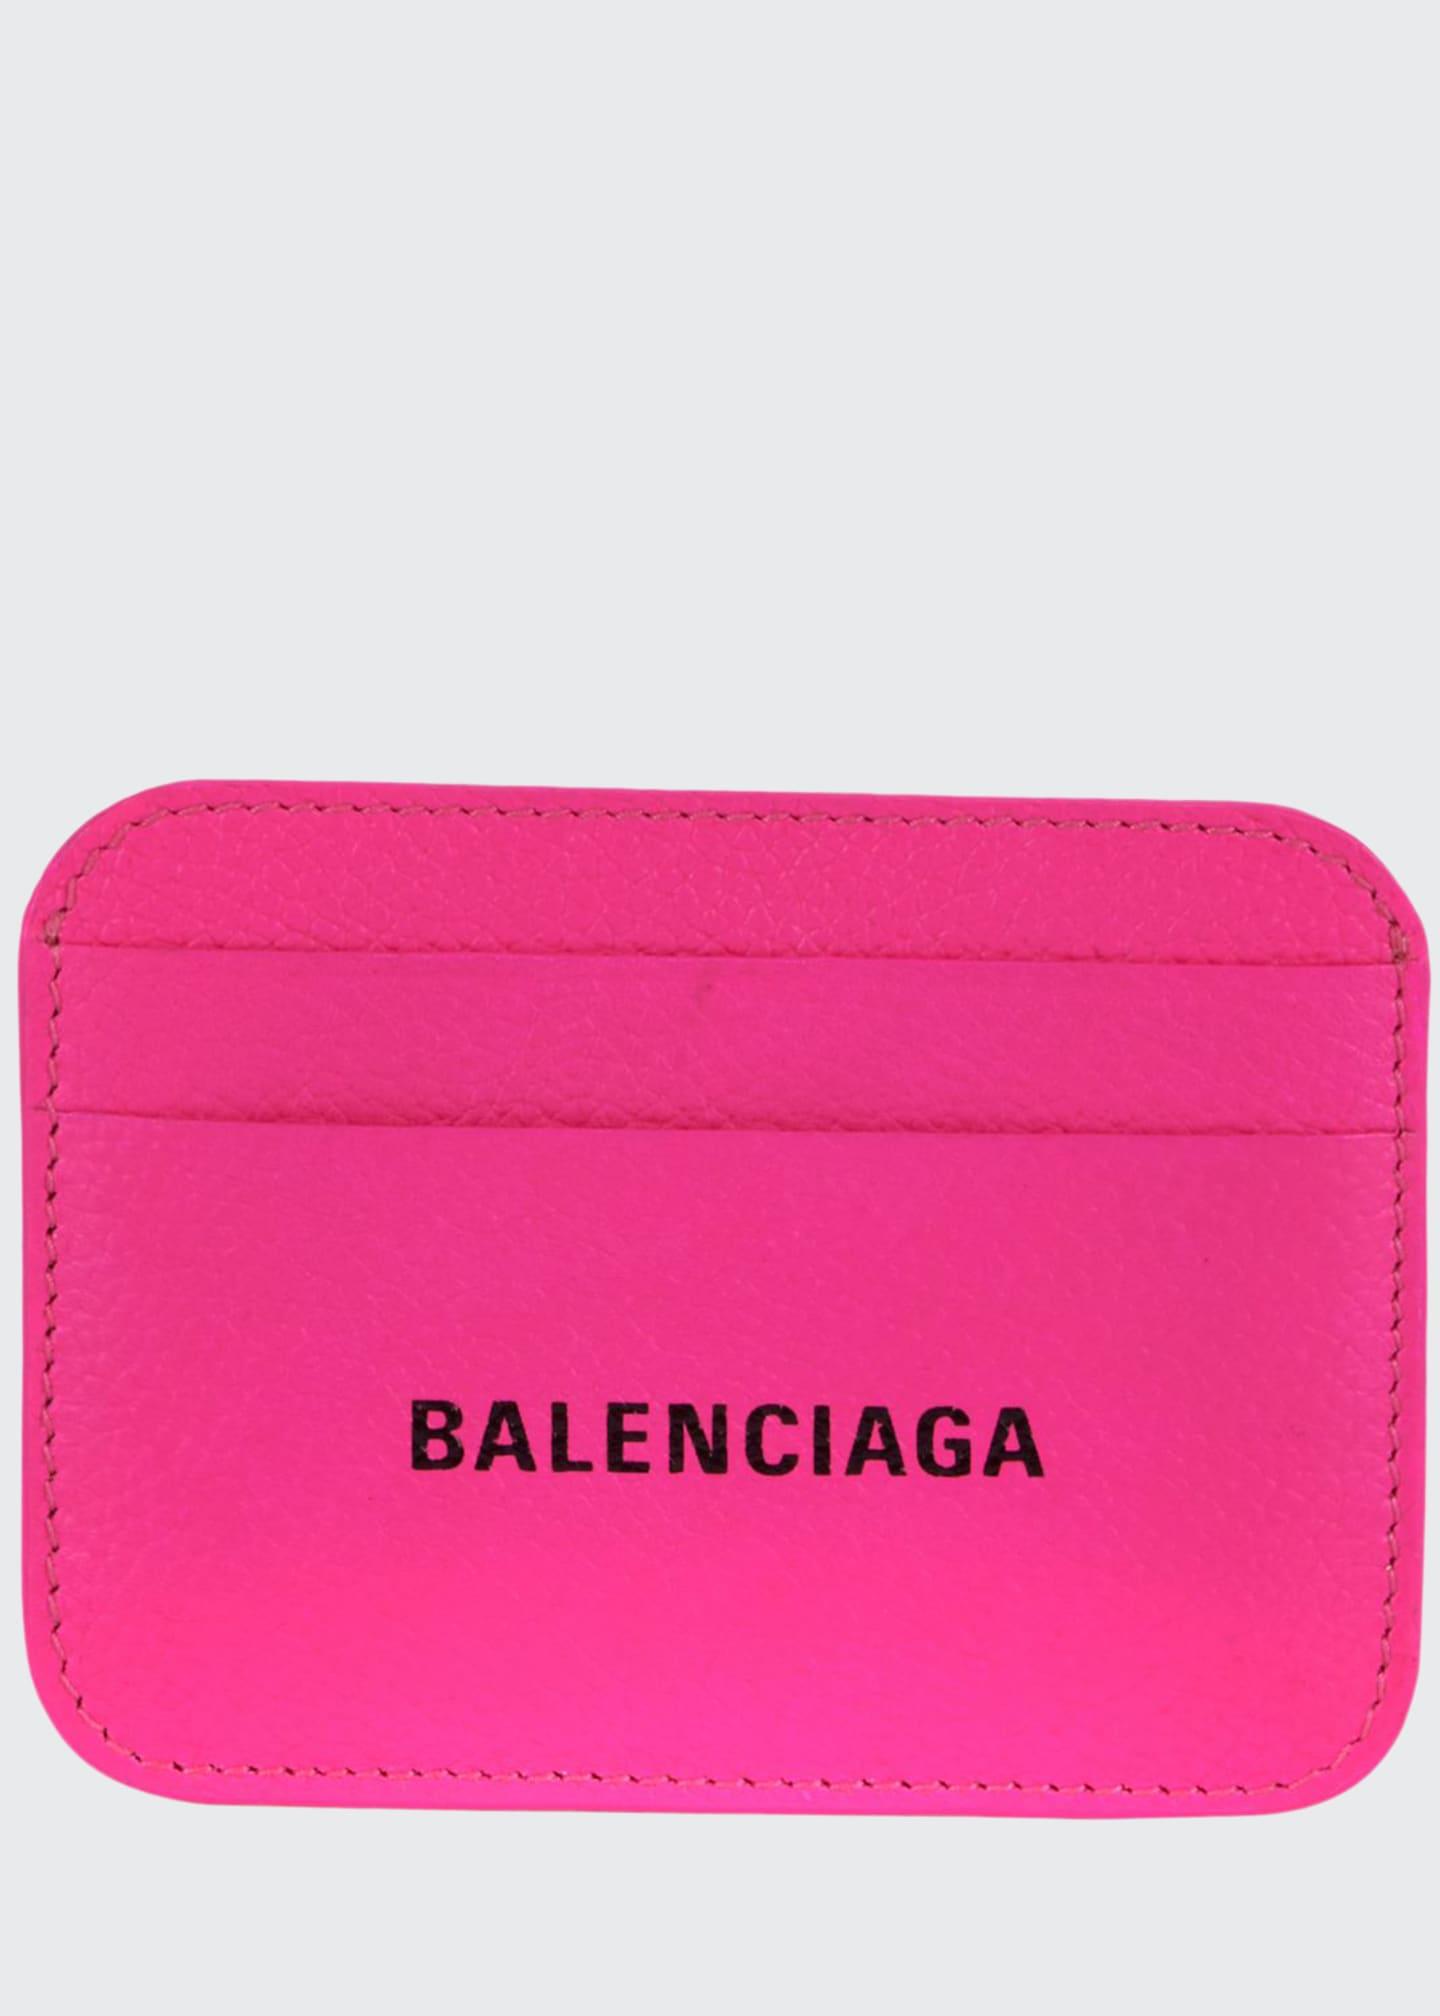 Balenciaga Grained Cash Card Holder